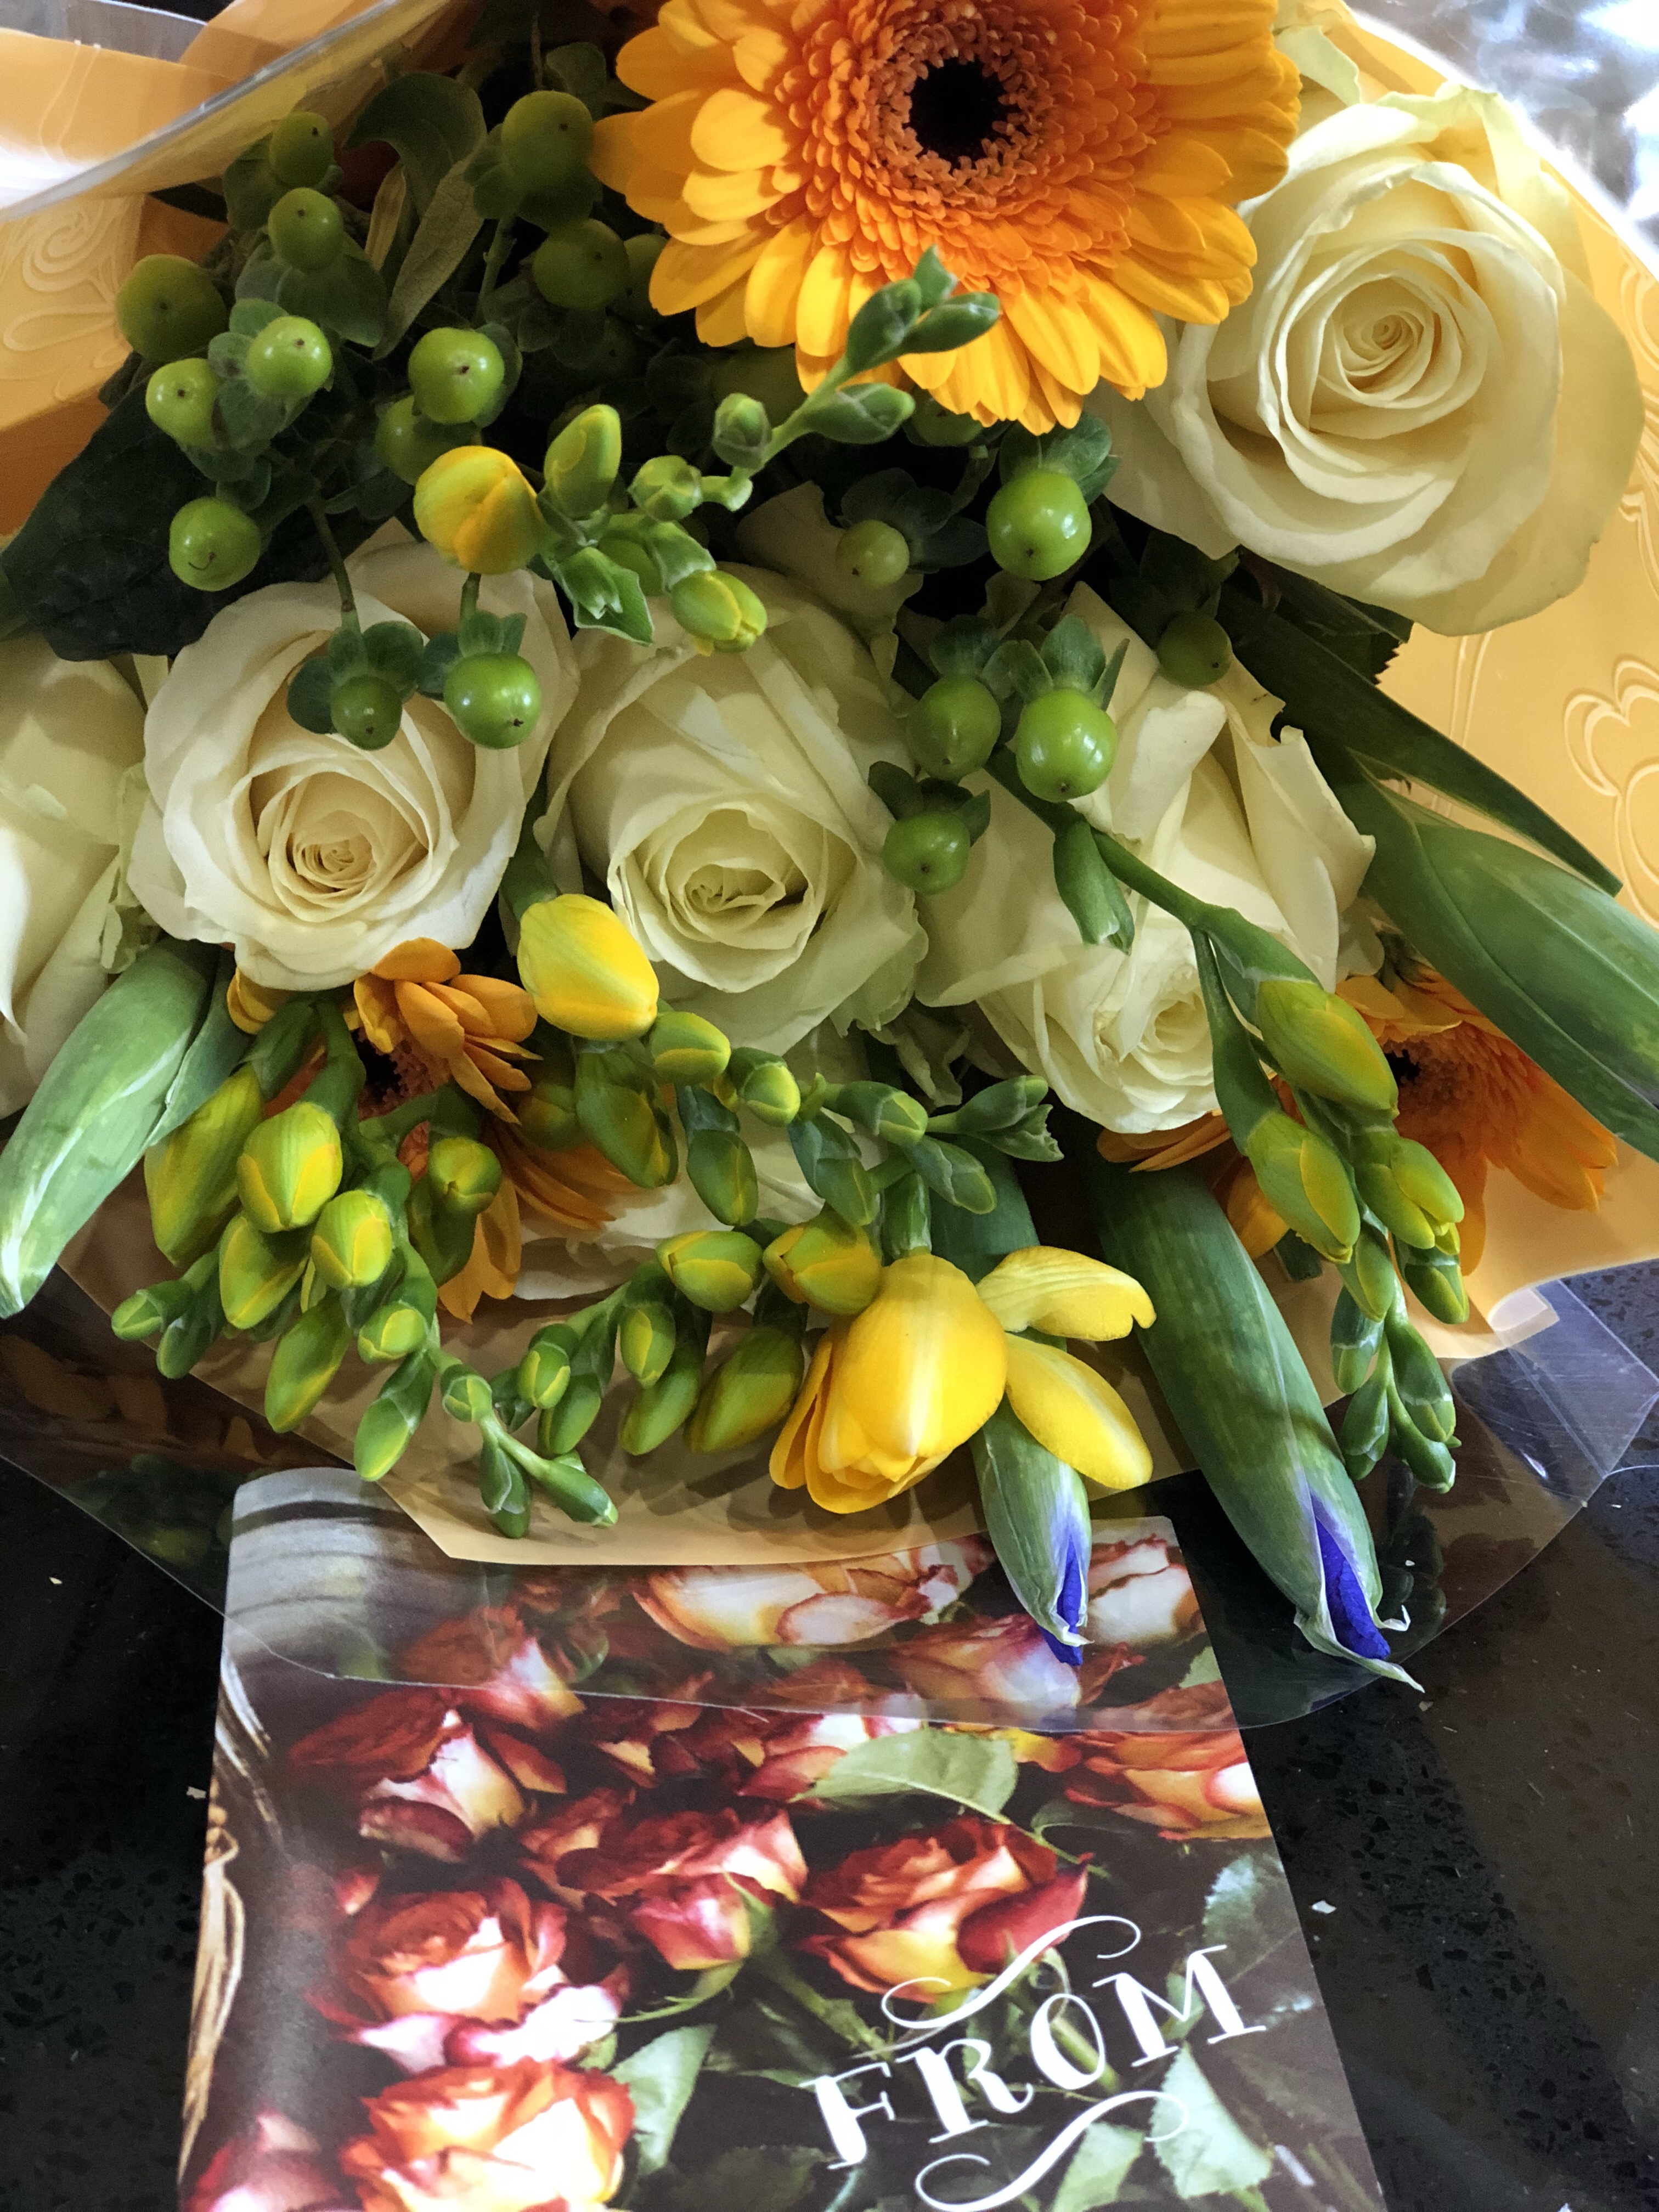 Home_bargain_flowers